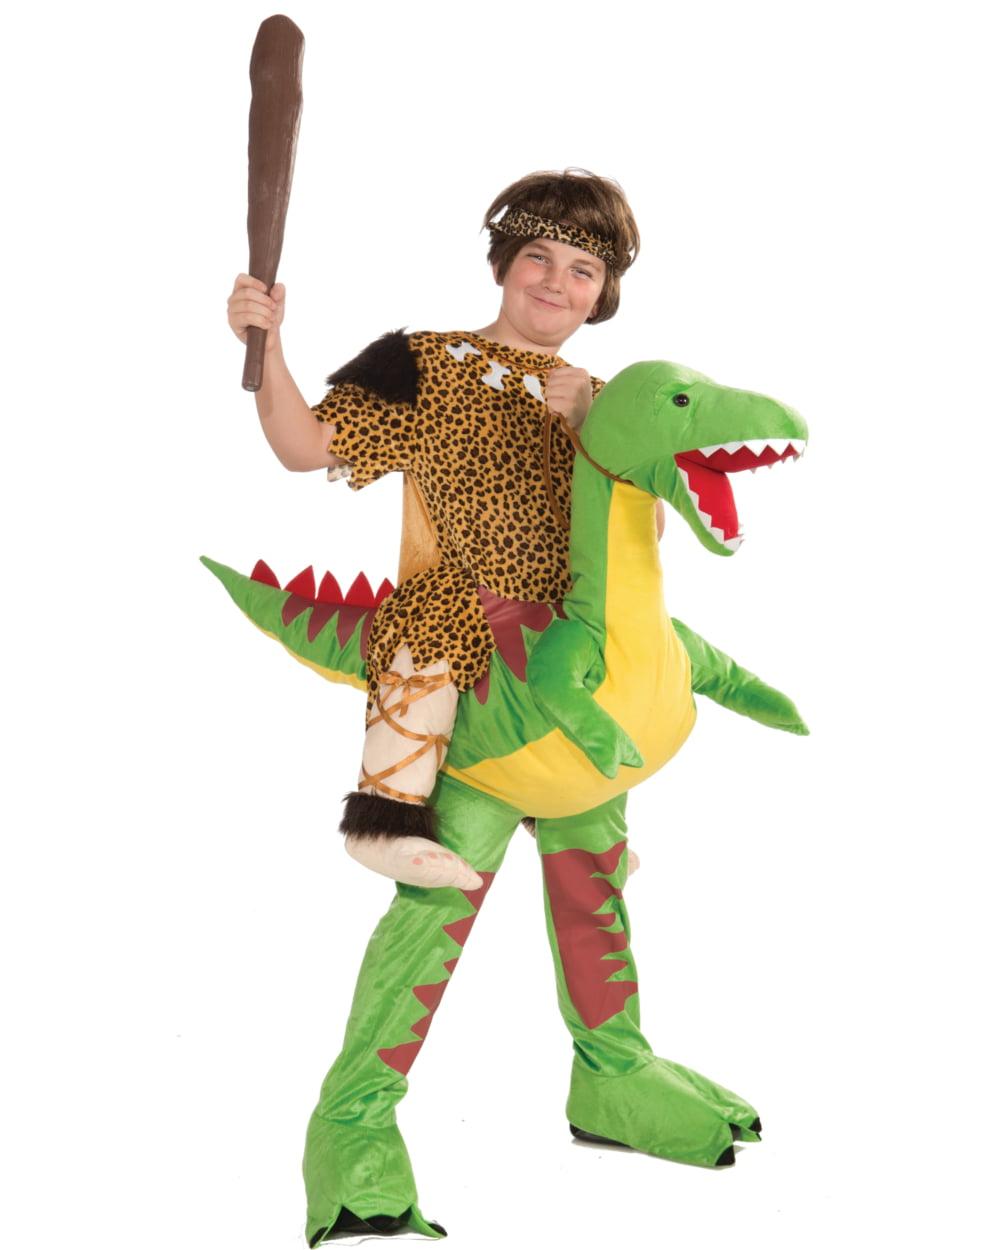 Kids Riding Dinosaur Cave Boy Stone Age Mascot Costume 1-Size Fits Most - Walmart.com  sc 1 st  Walmart & Kids Riding Dinosaur Cave Boy Stone Age Mascot Costume 1-Size Fits ...